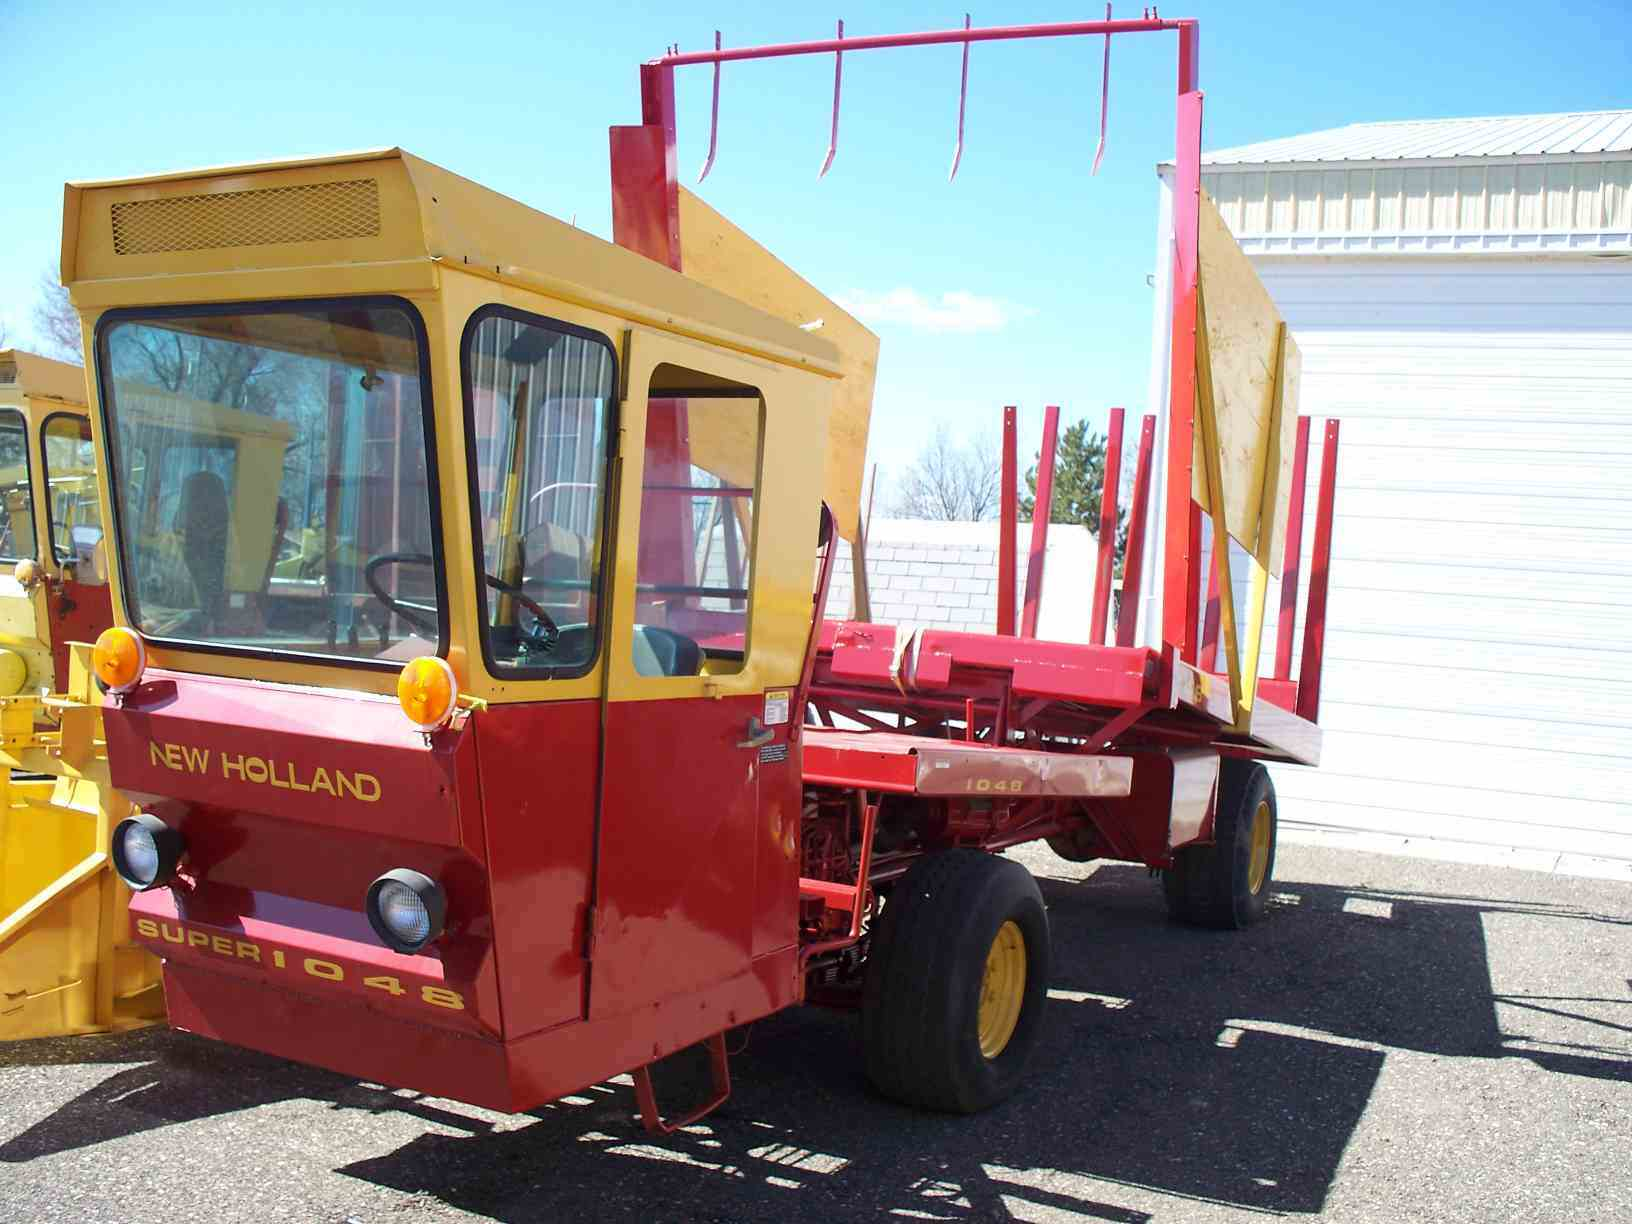 Jim Wilhite's New Holland Balewagons, by your Balewagon / Bale Wagon